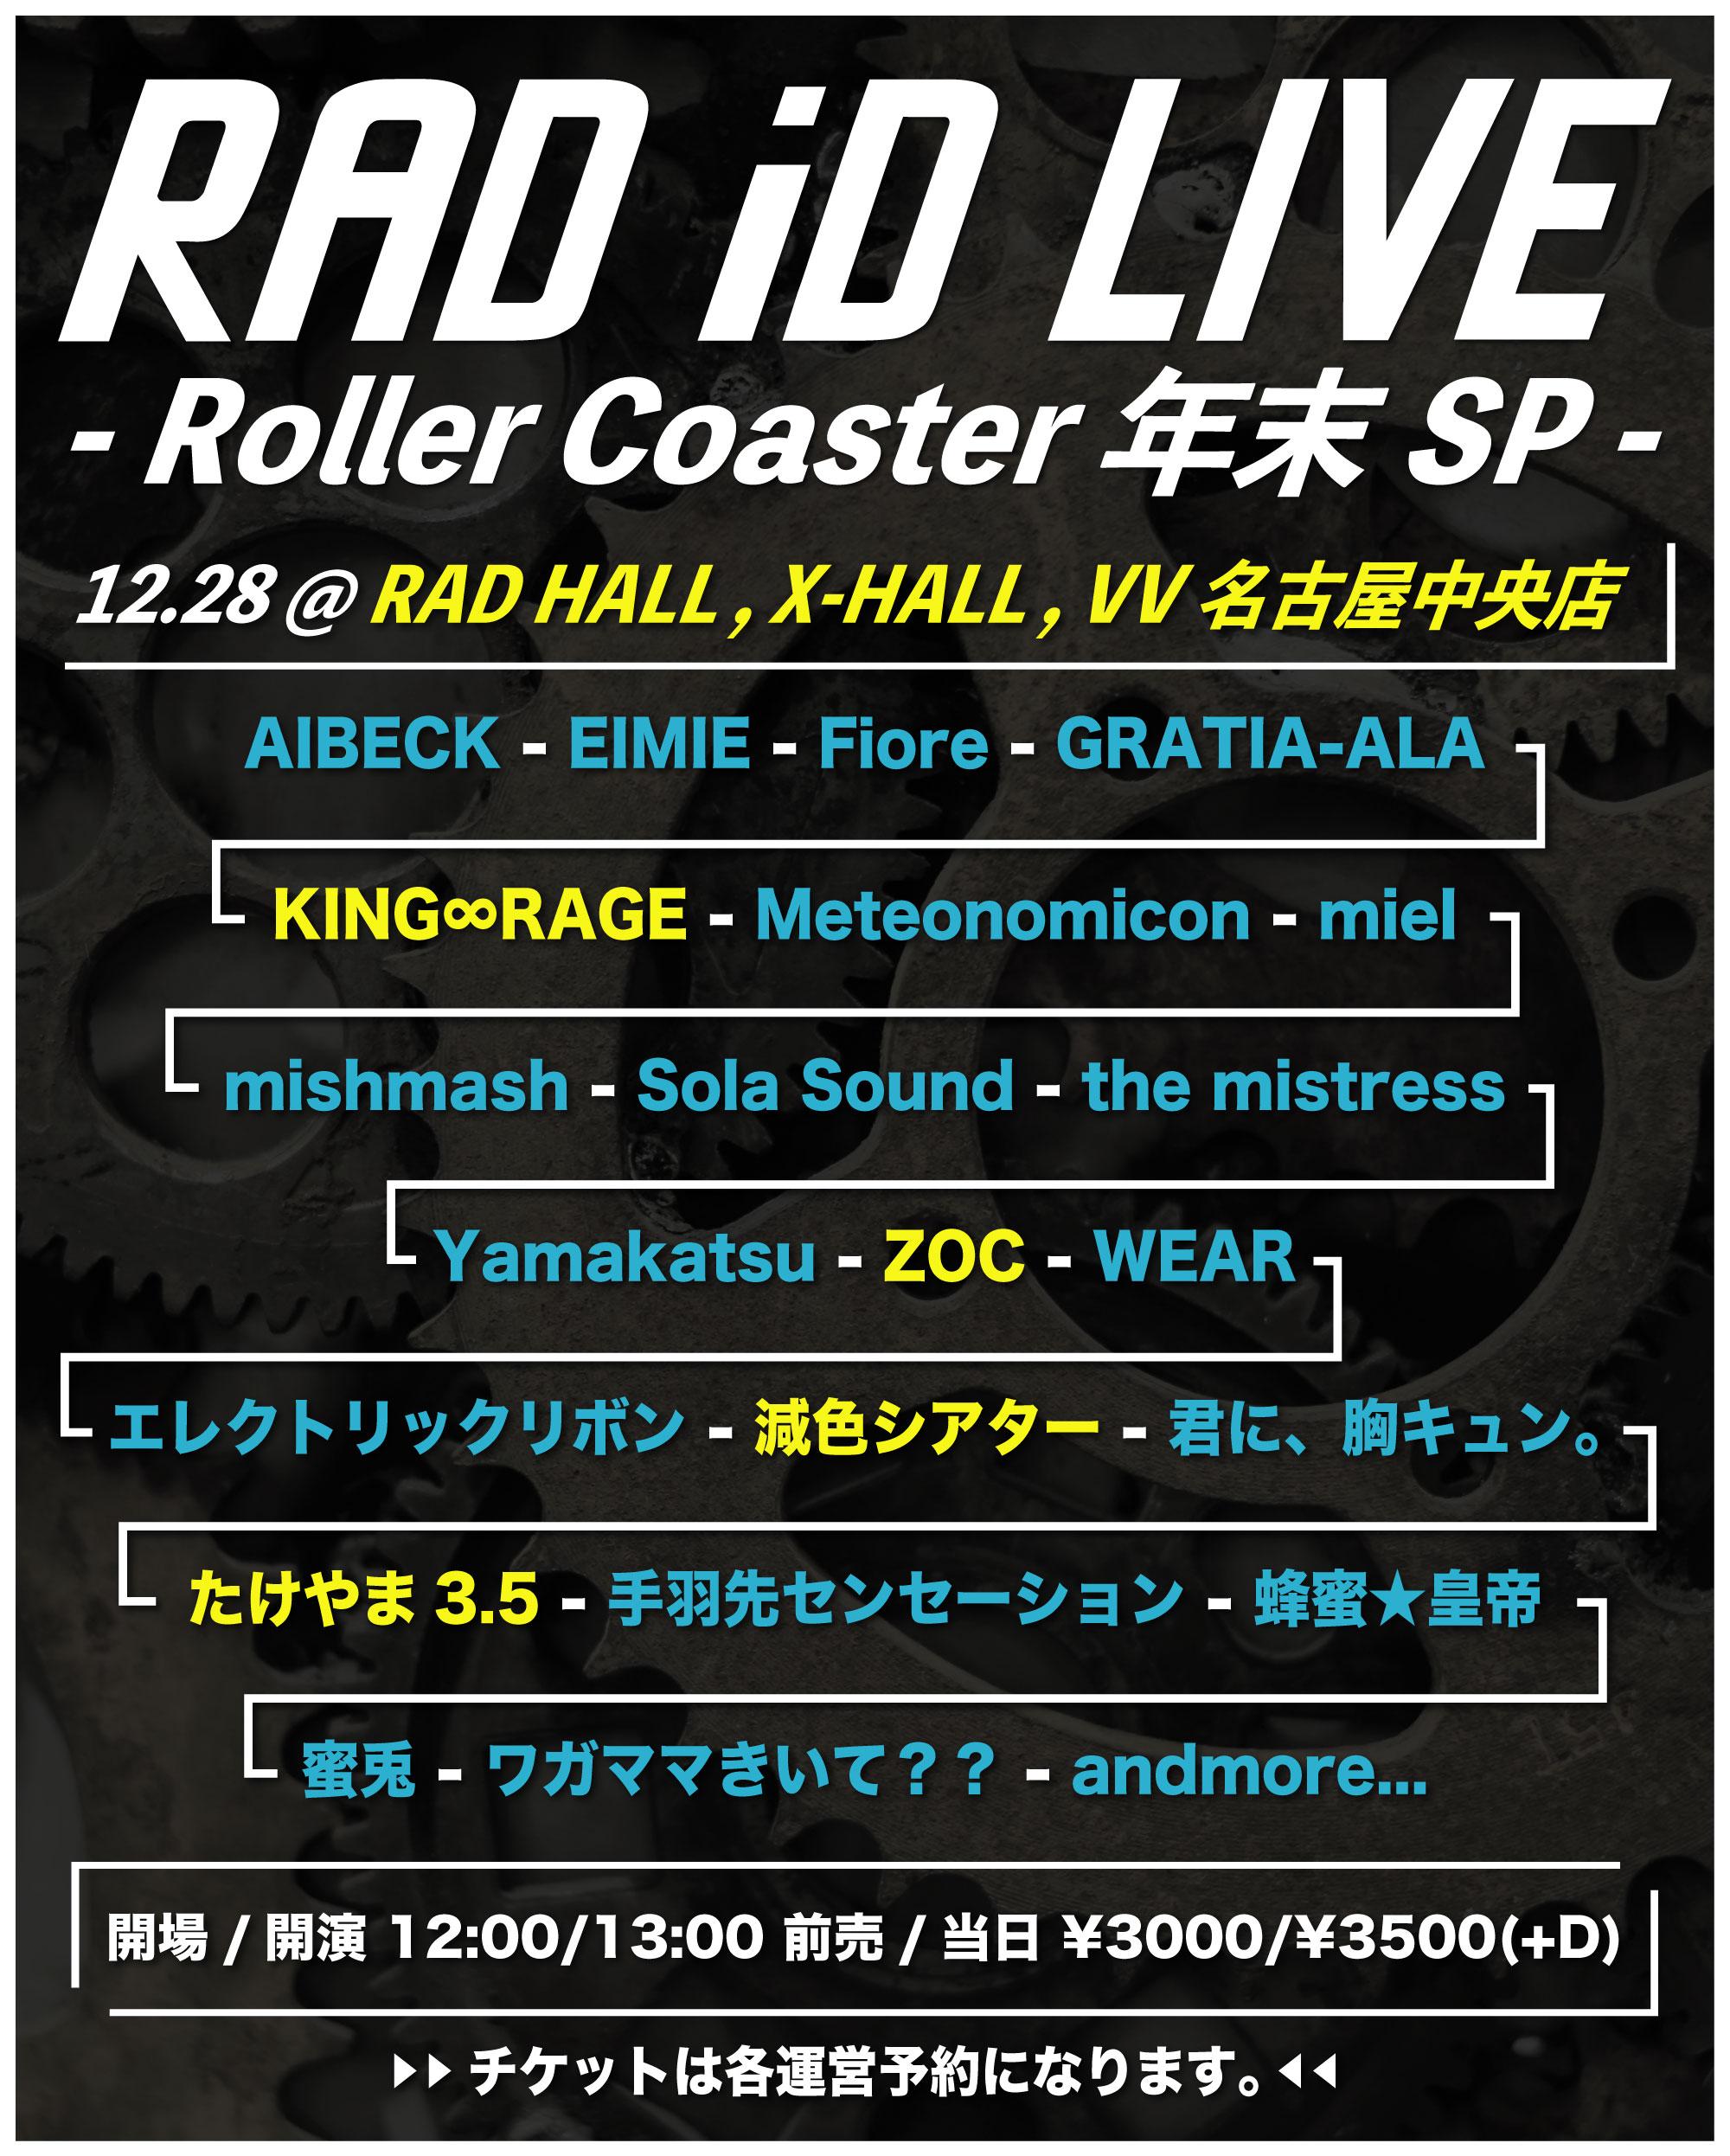 RAD iD LIVE -Roller Coaster 年末SP-